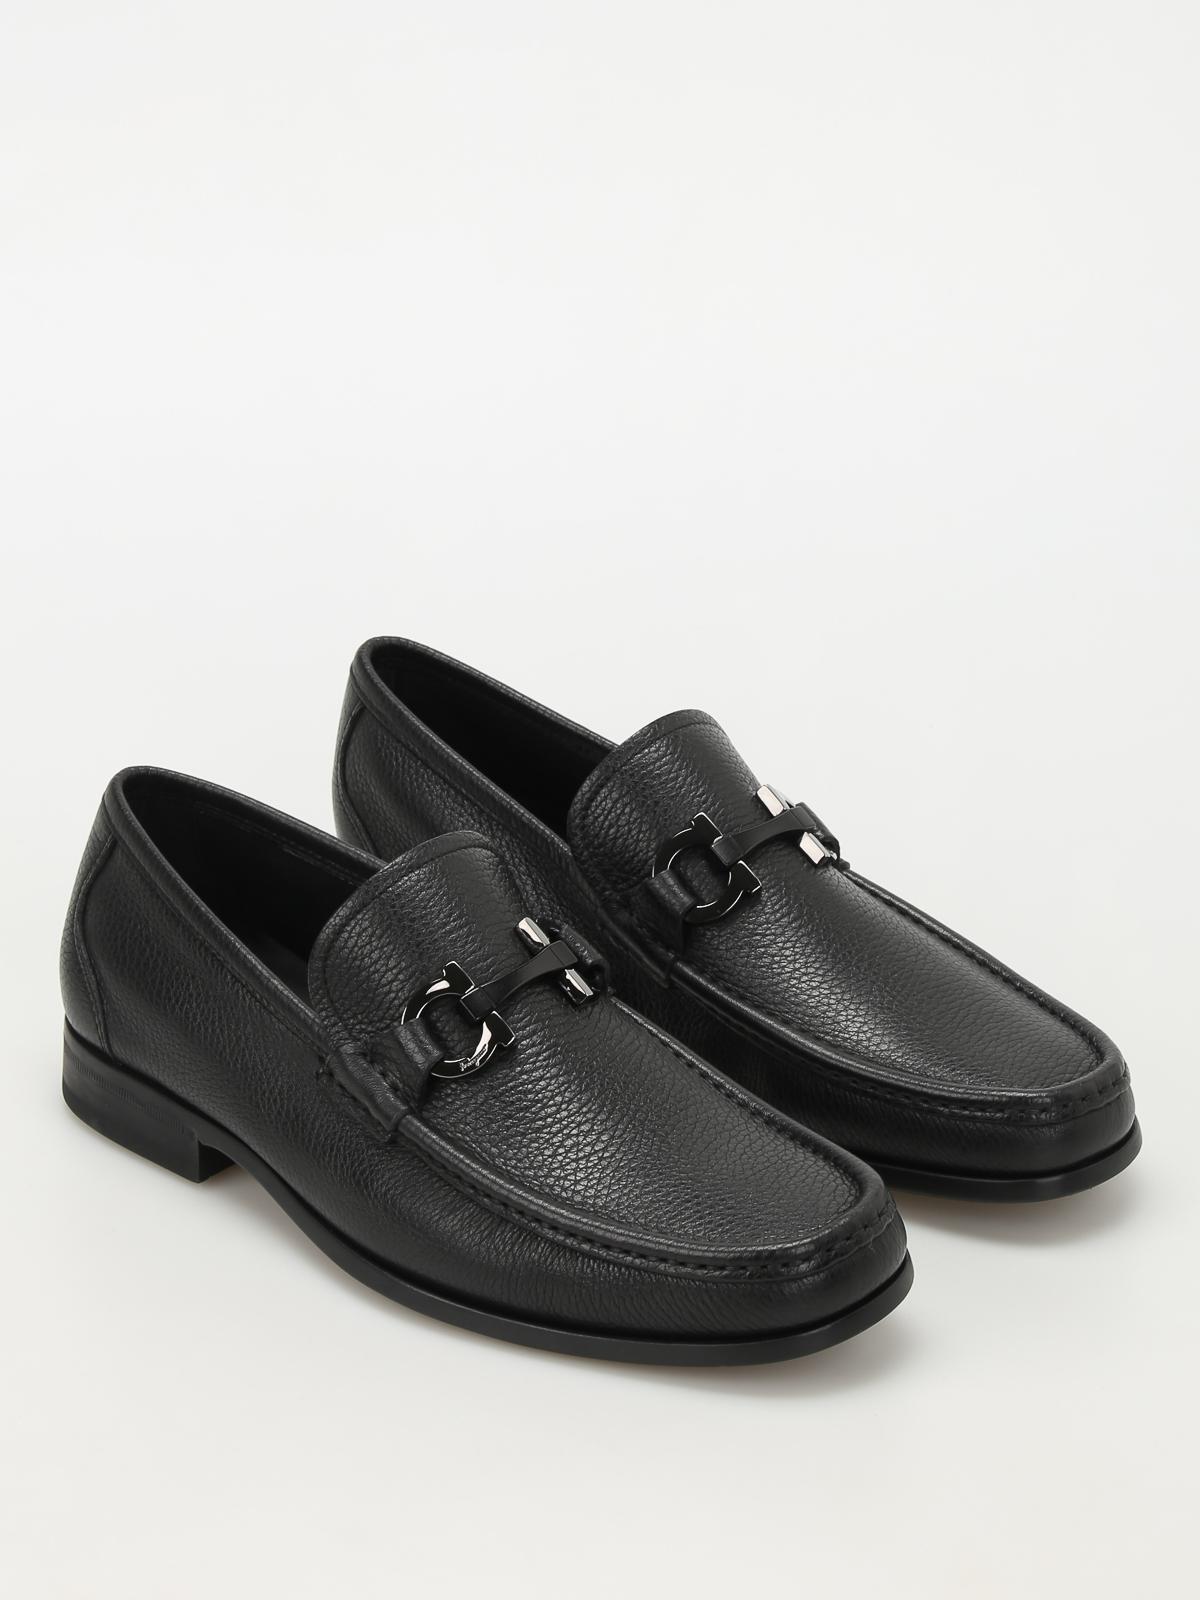 Grandioso Mocassinsamp; Salvatore Chaussures Ferragamo Mocassin QtdhCsrx